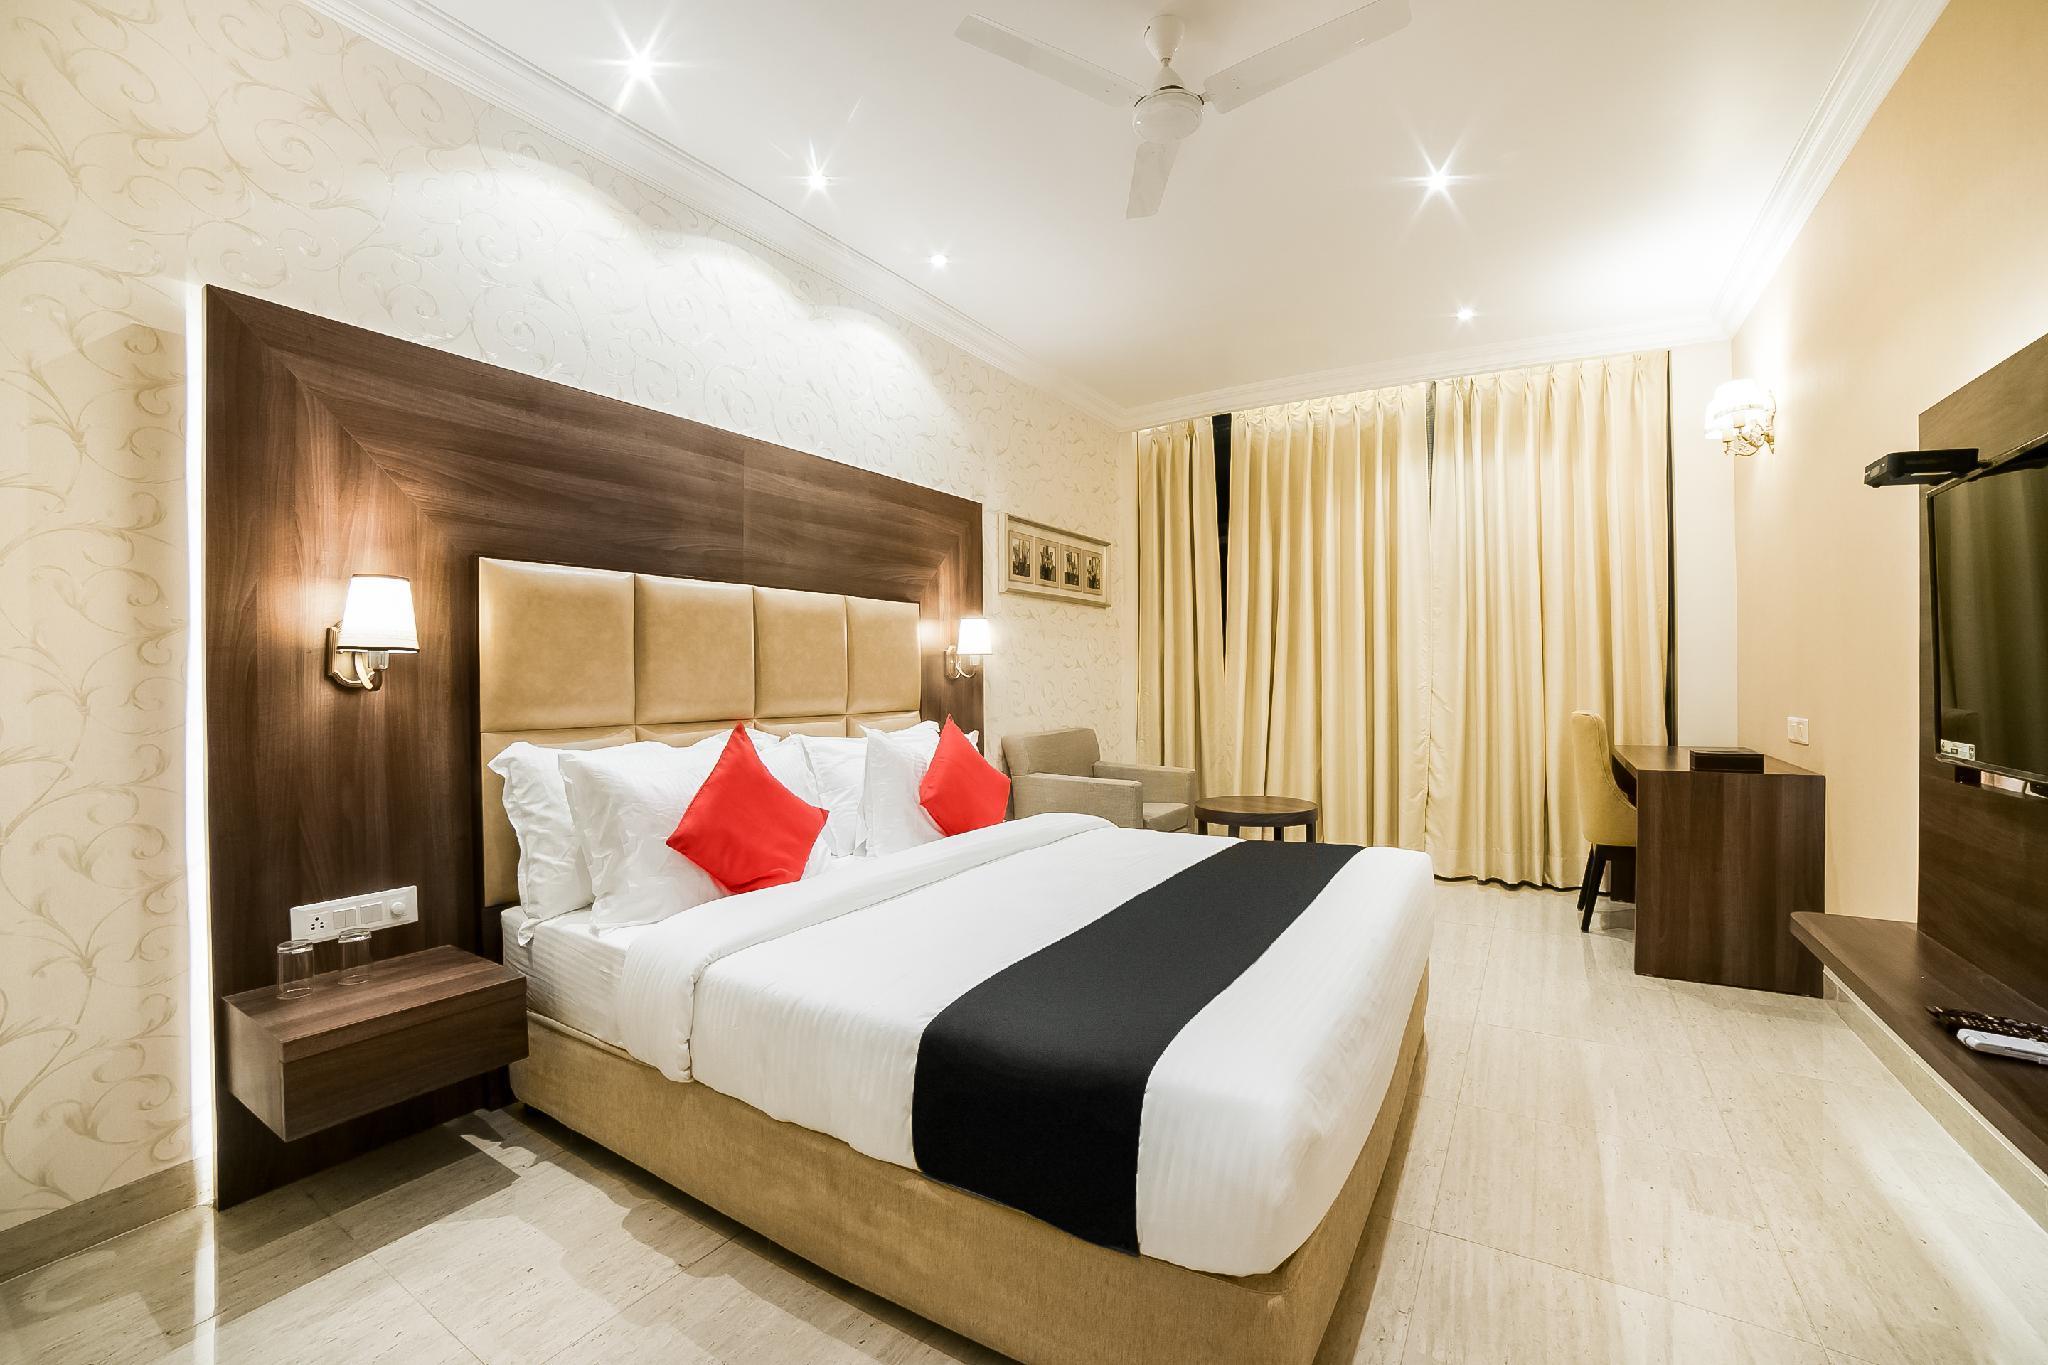 Capital O 46171 Antram Premiere Hotel